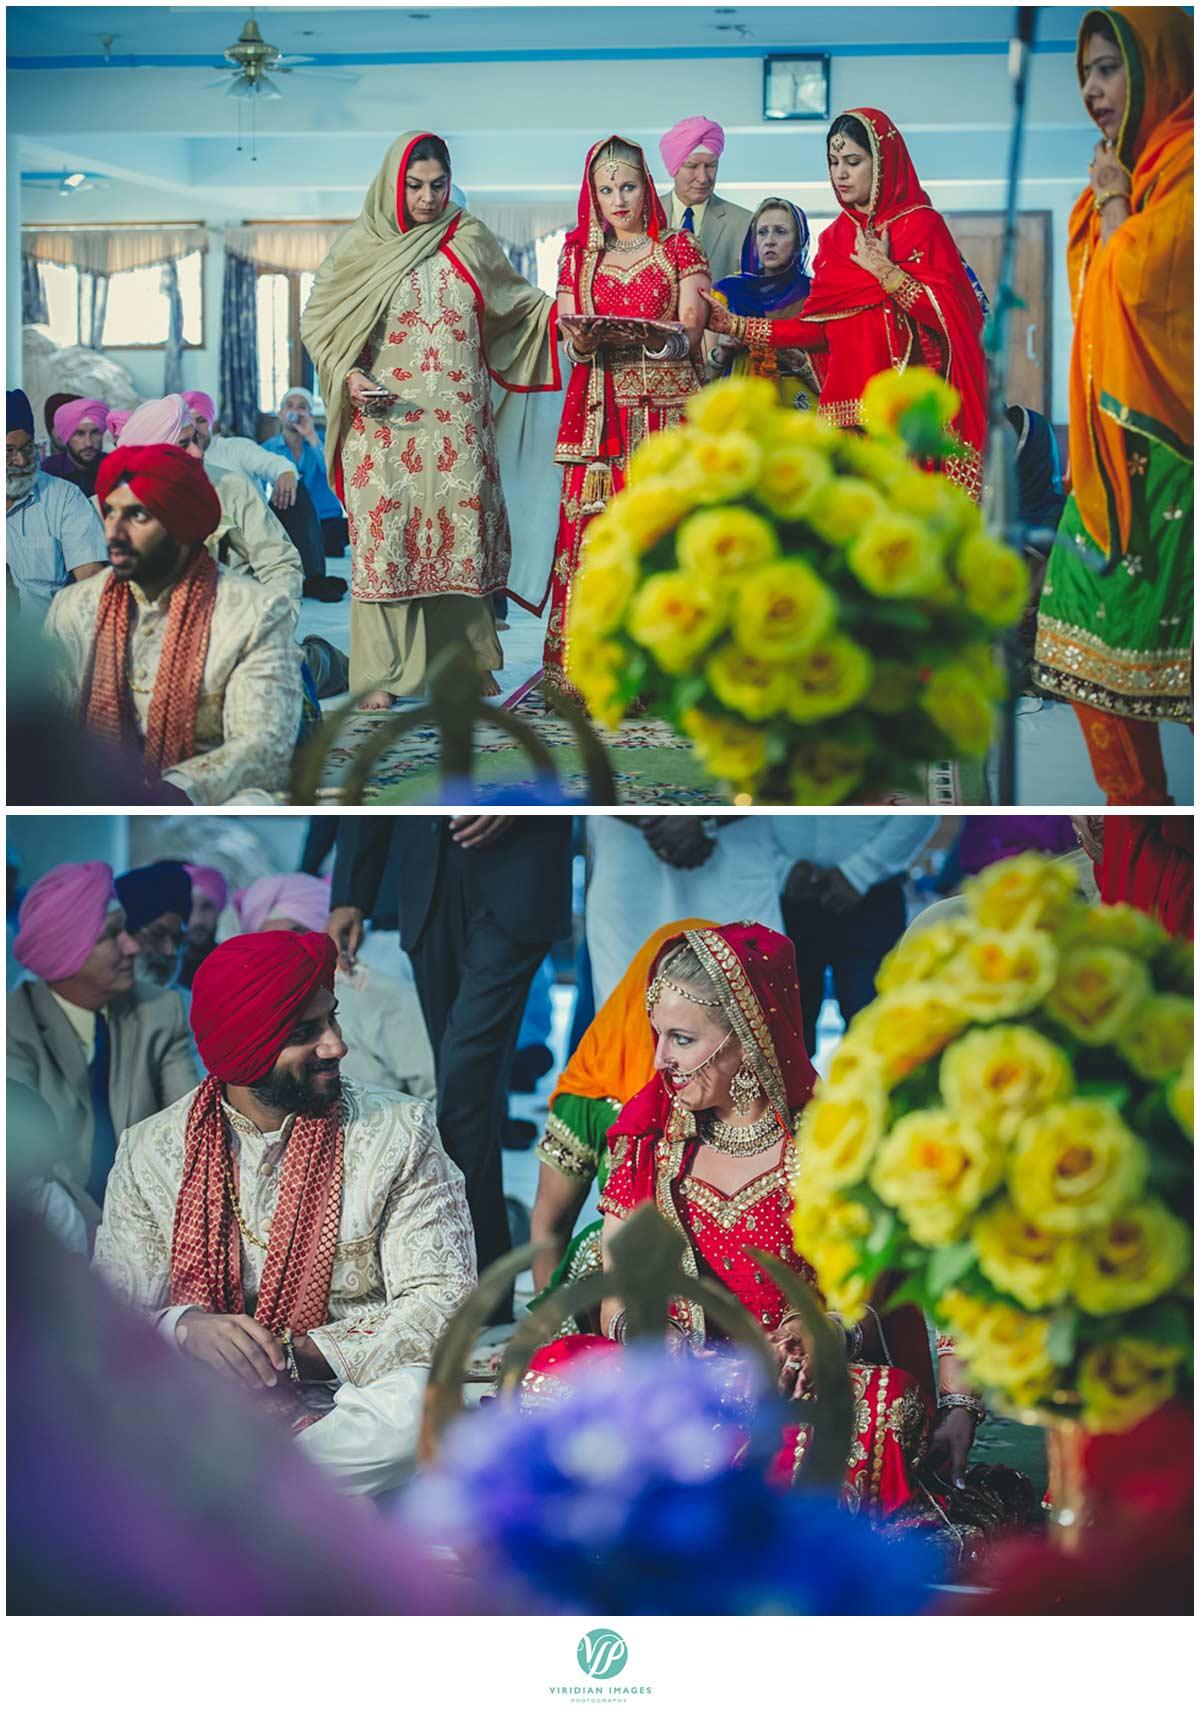 India_Chandigarh_Wedding_Viridian_Images_Photography_poto_20